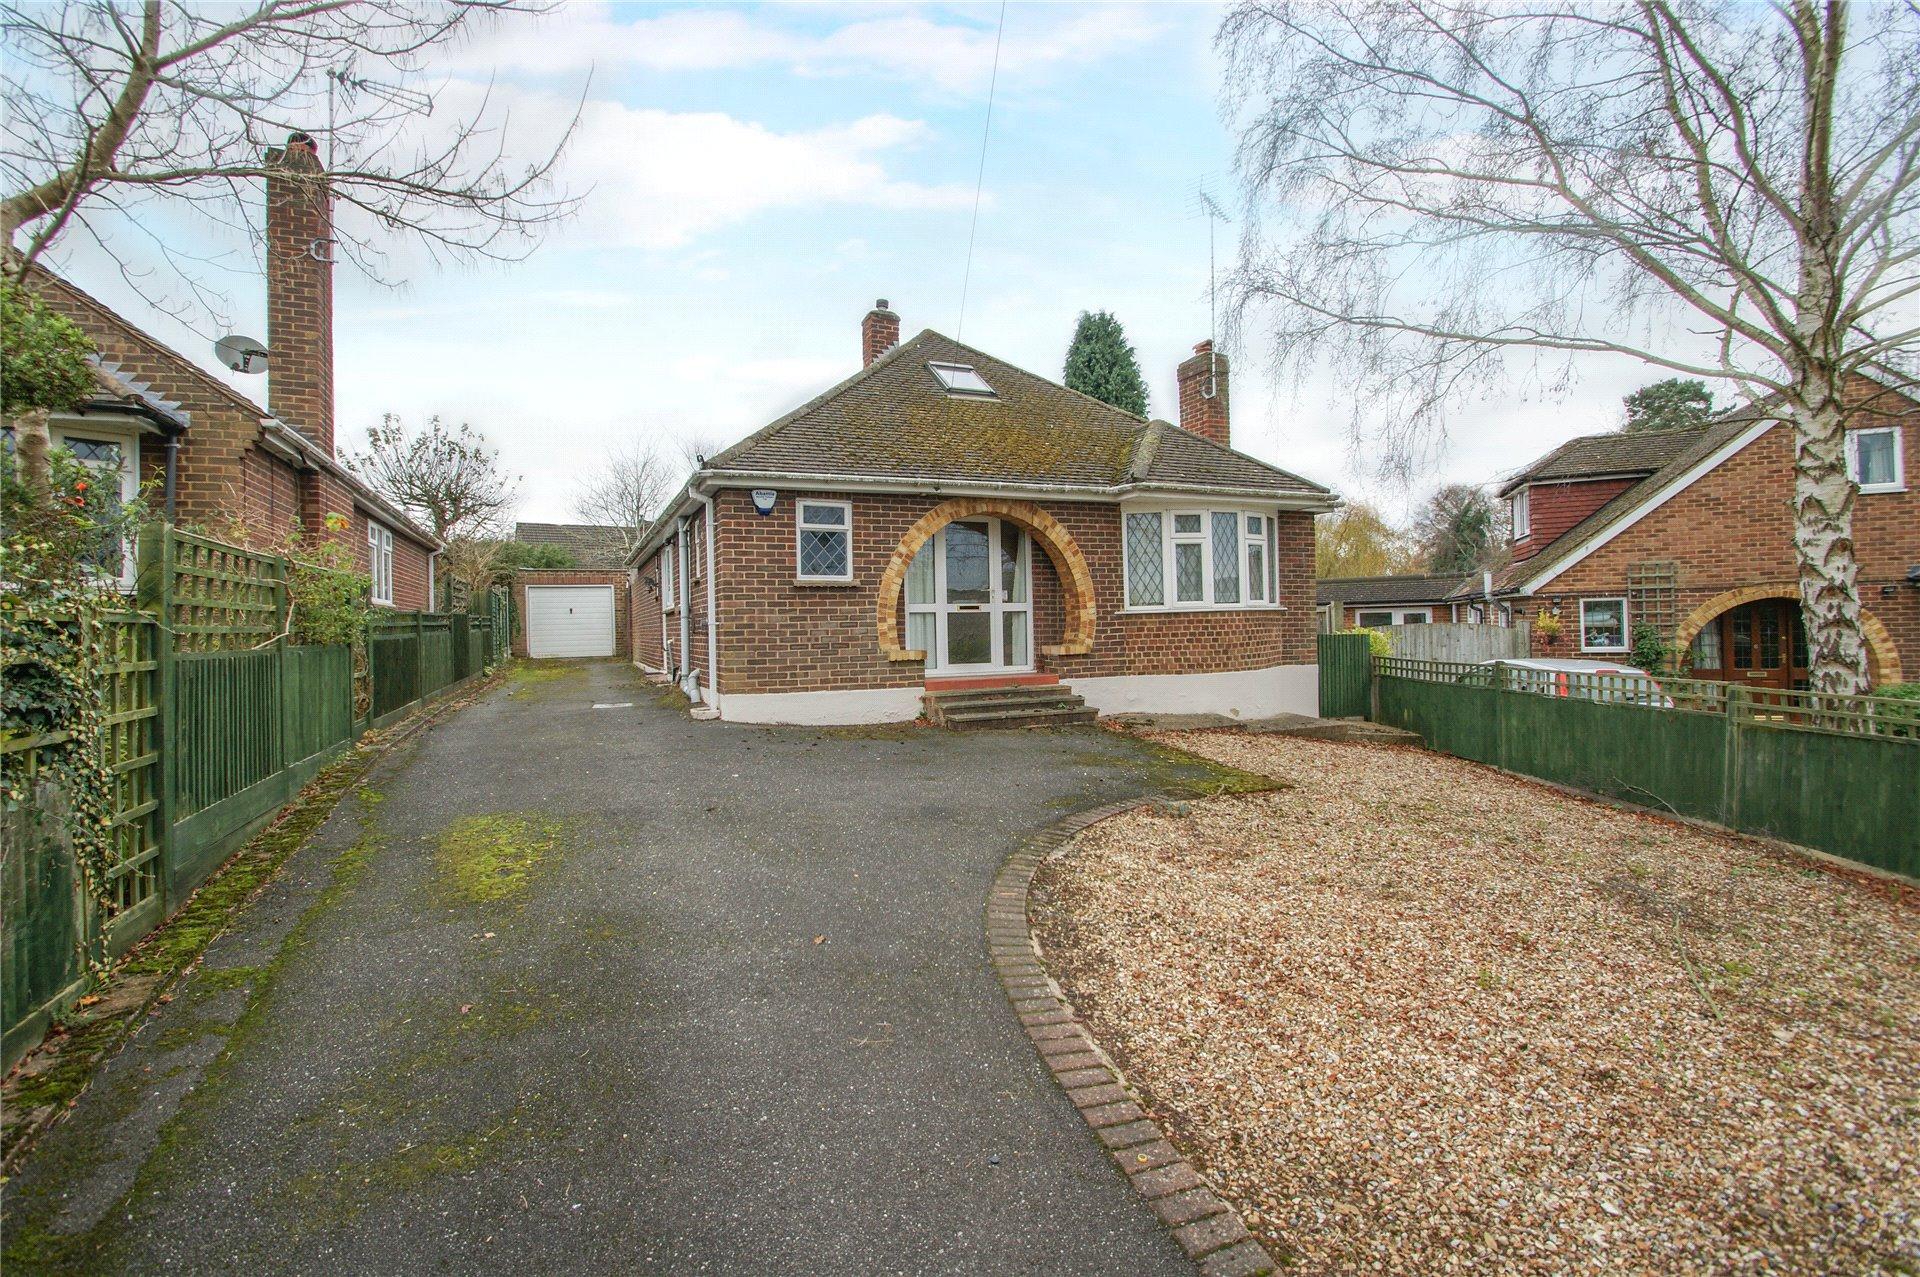 3 Bedrooms Detached Bungalow for sale in Summit Close, Finchampstead, Wokingham, Berkshire, RG40